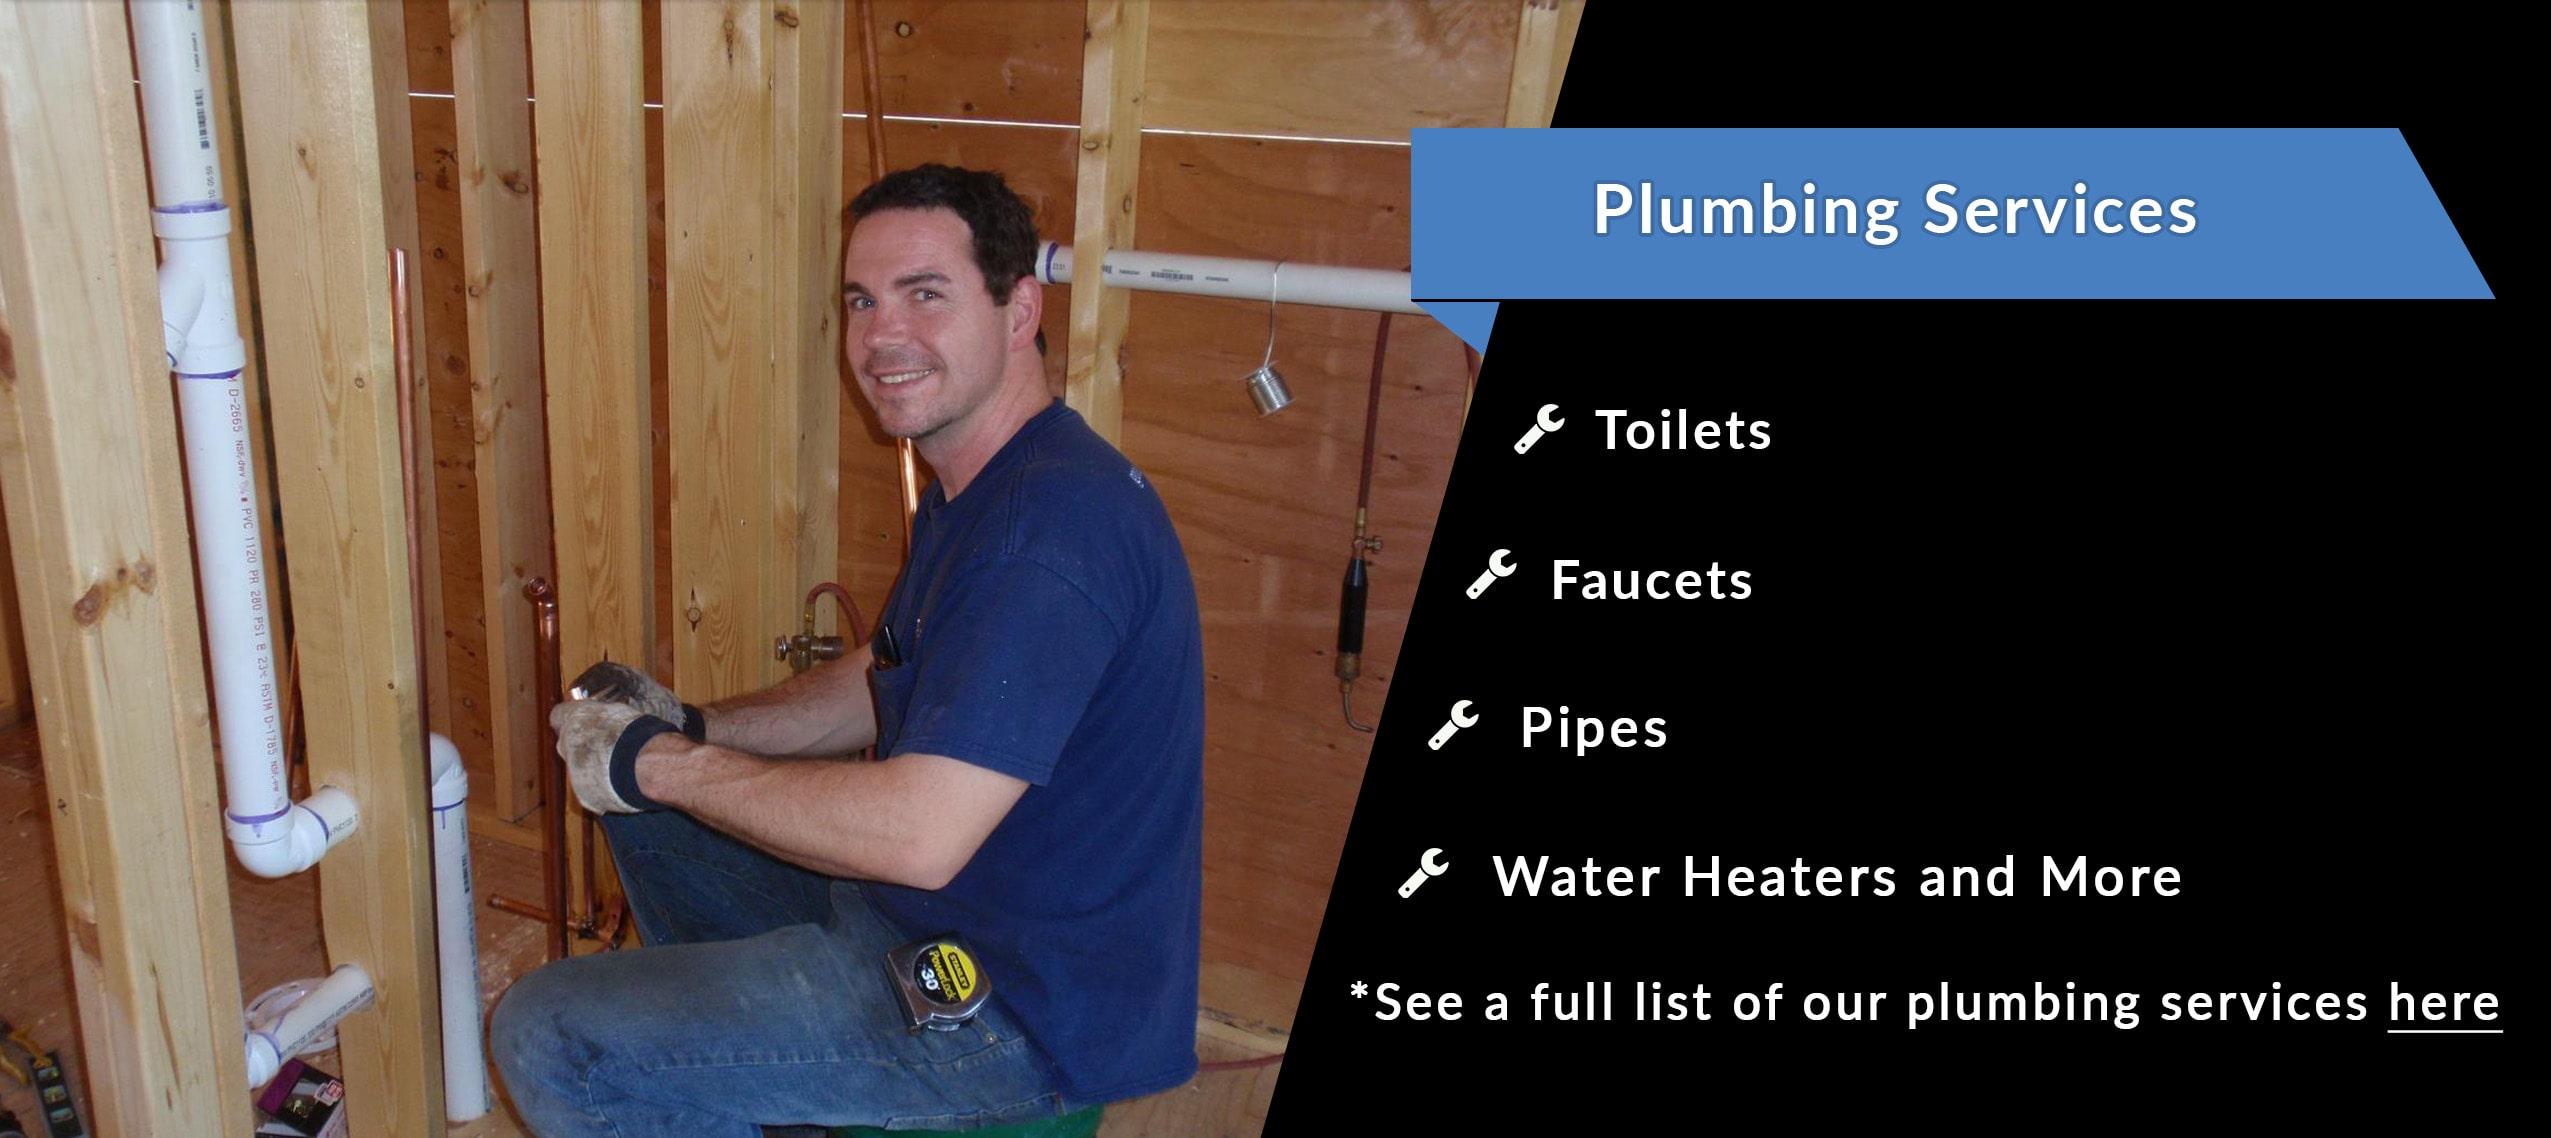 Downers Grove Plumbers Residential Plumbing Company